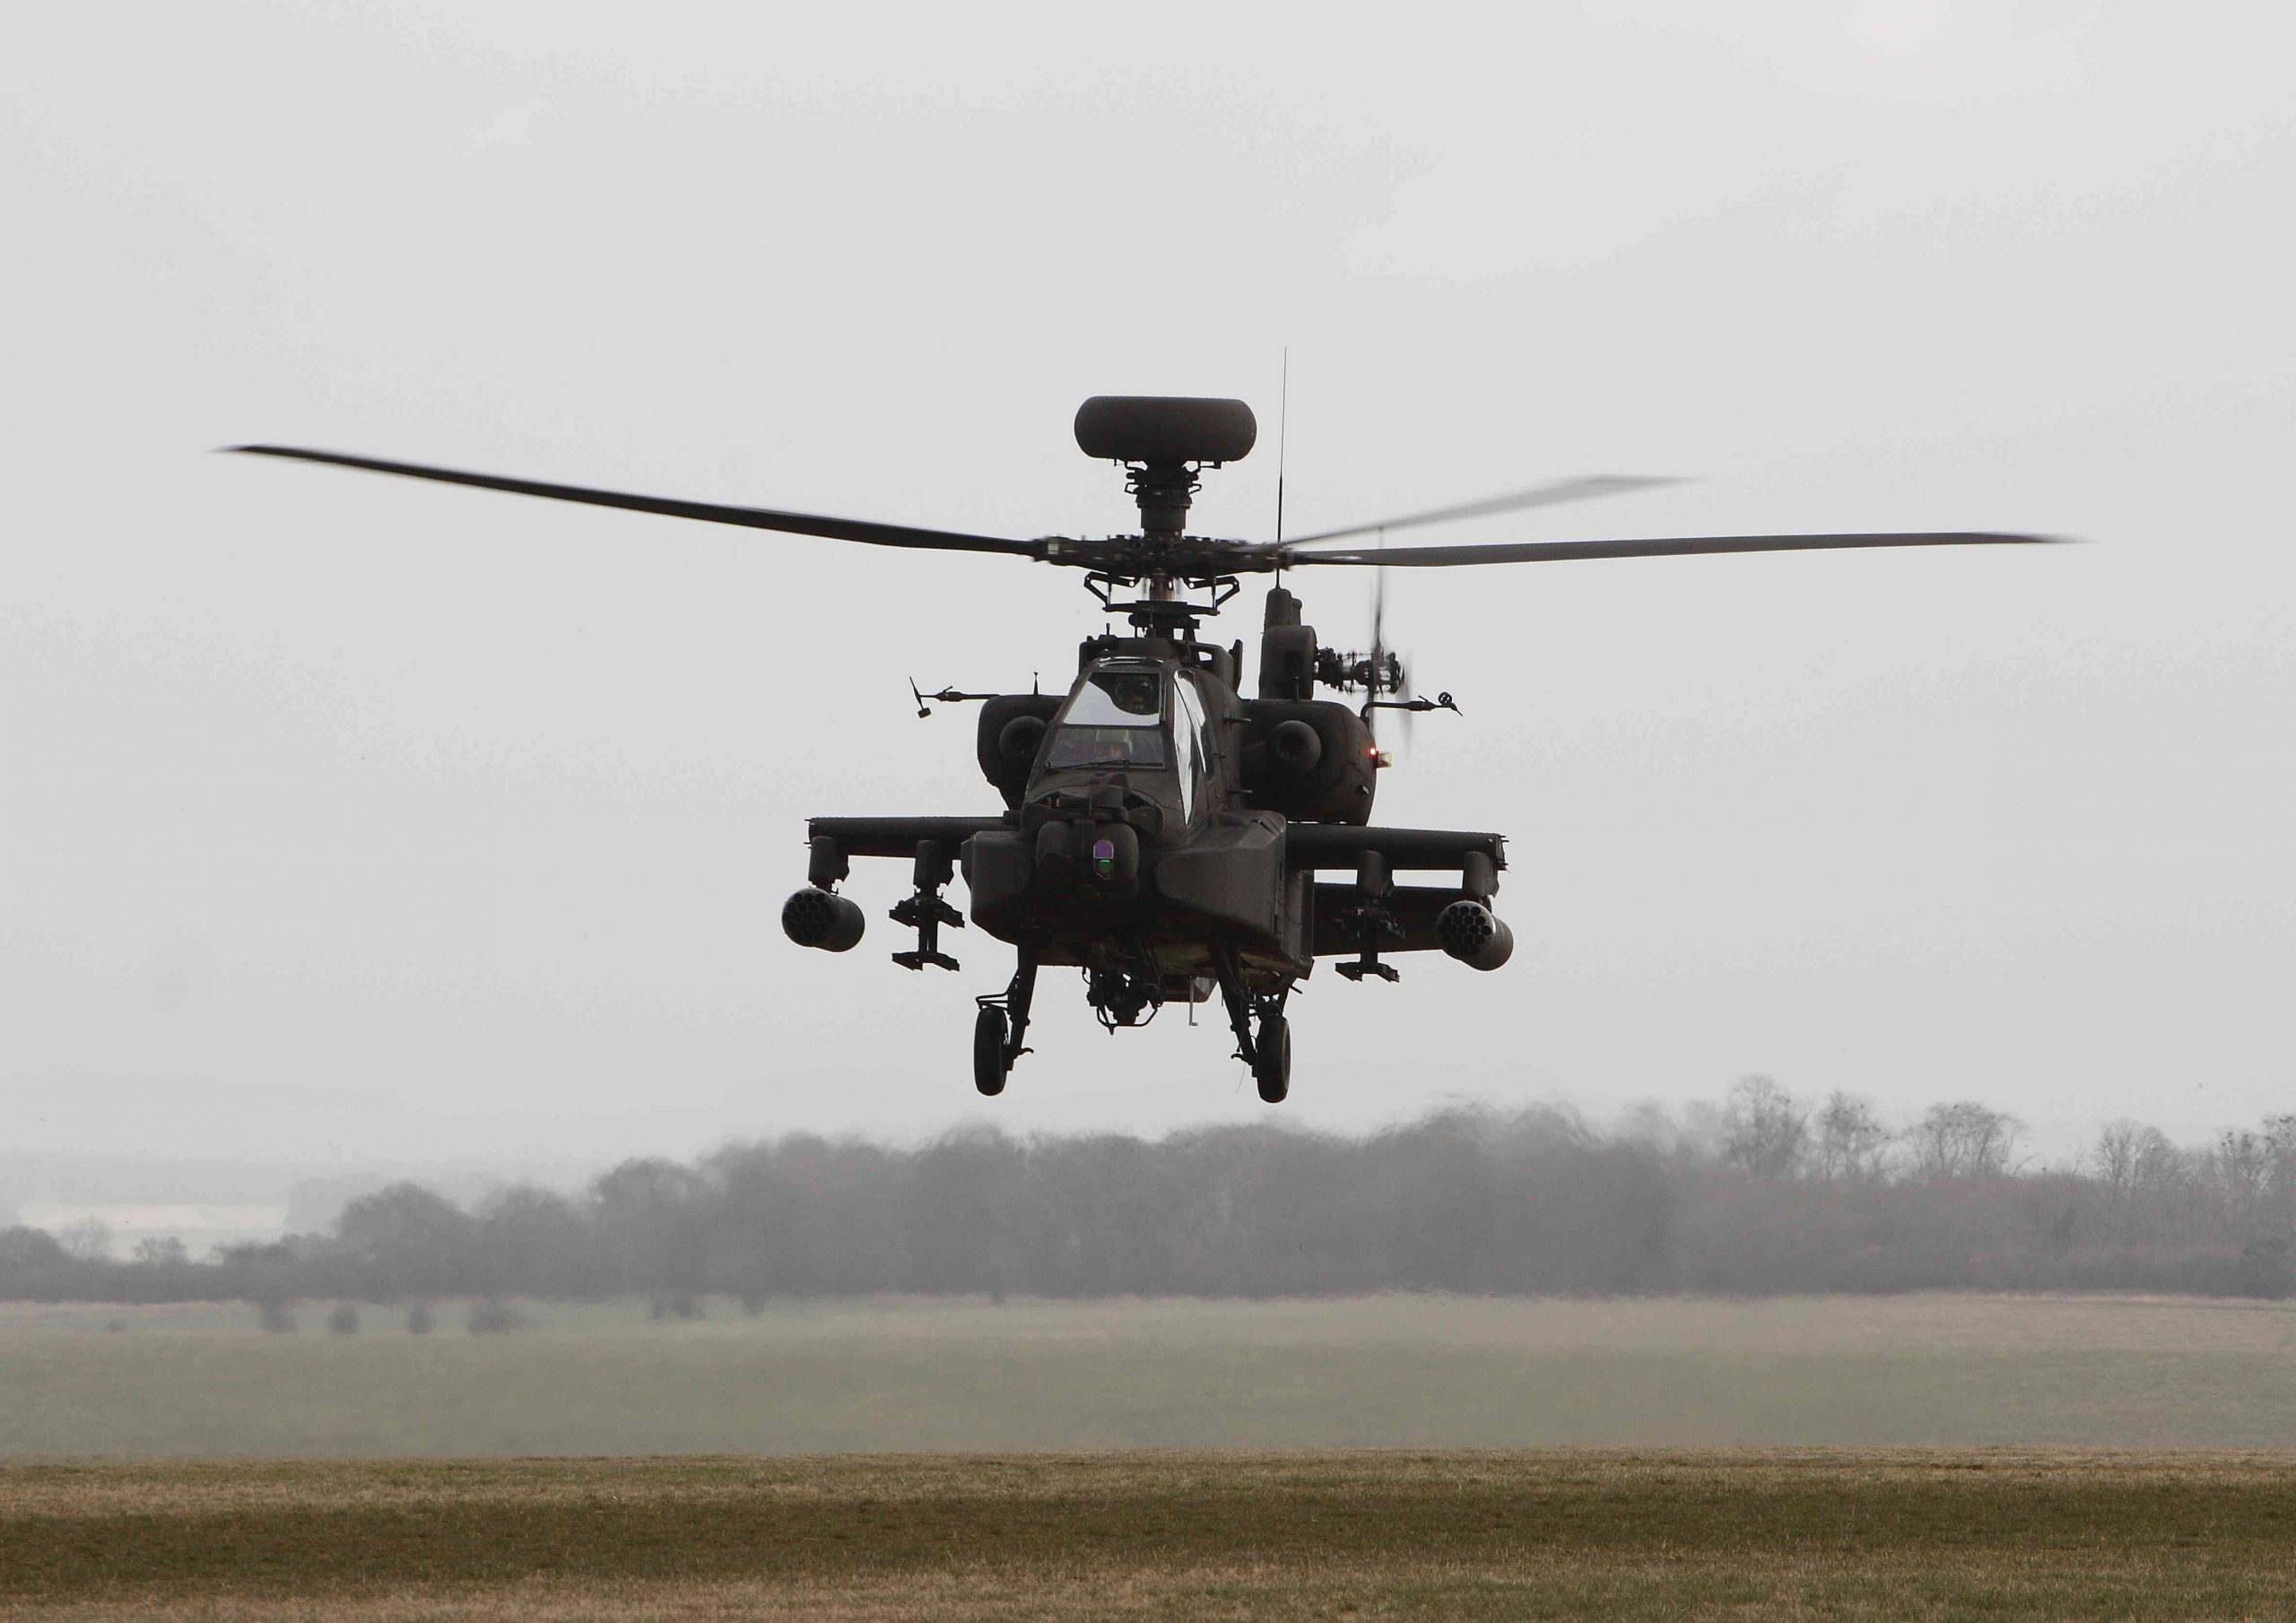 apache-helicopter-gunship-8679532 mobile